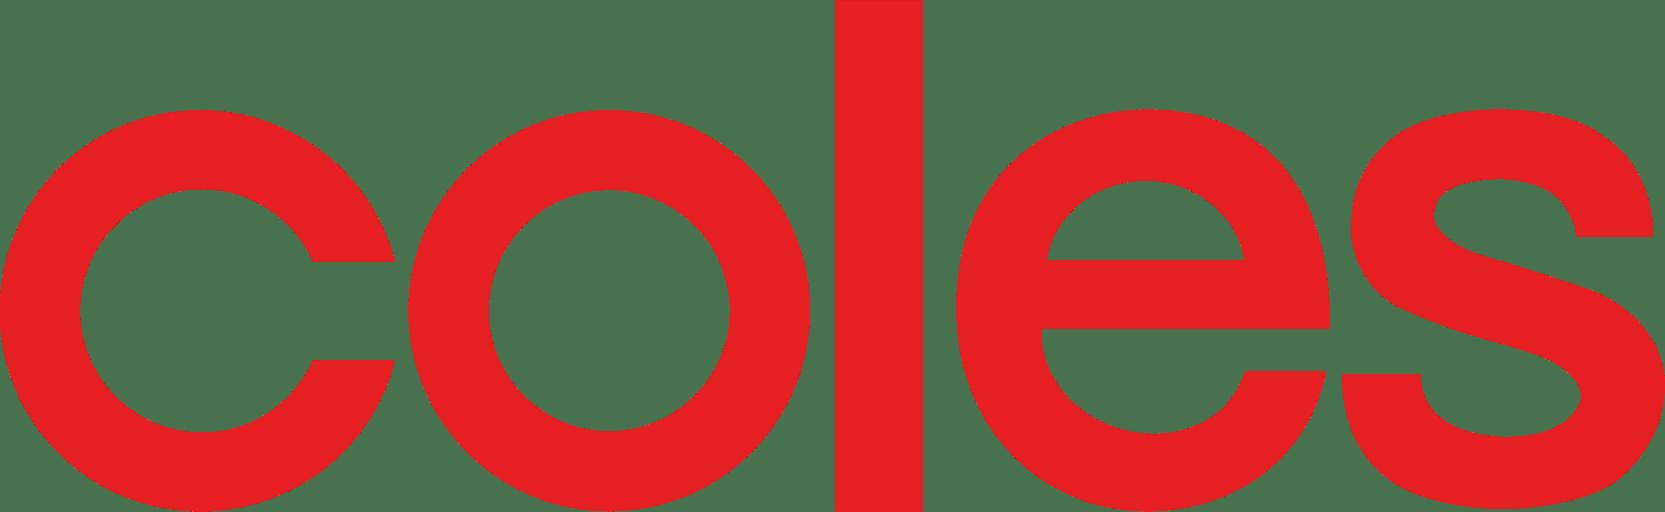 Coles Supermarkets Logo transparent PNG.